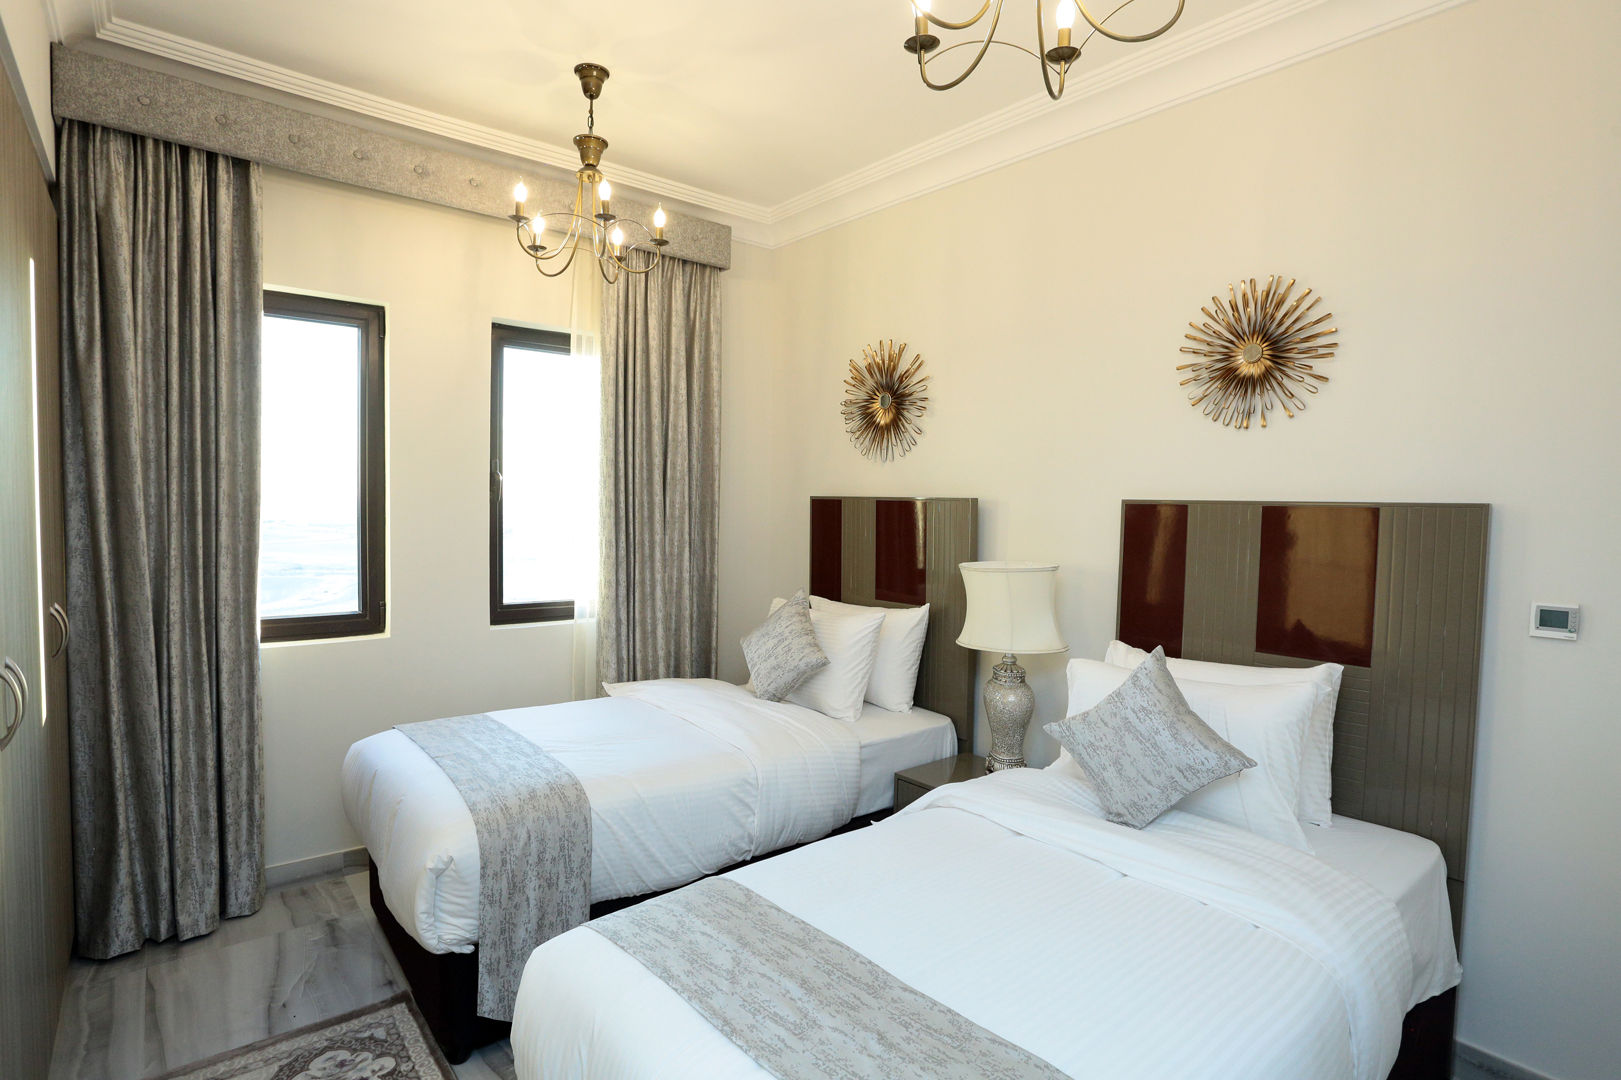 Marbella Luxury 2 bedrooms photo 27263080